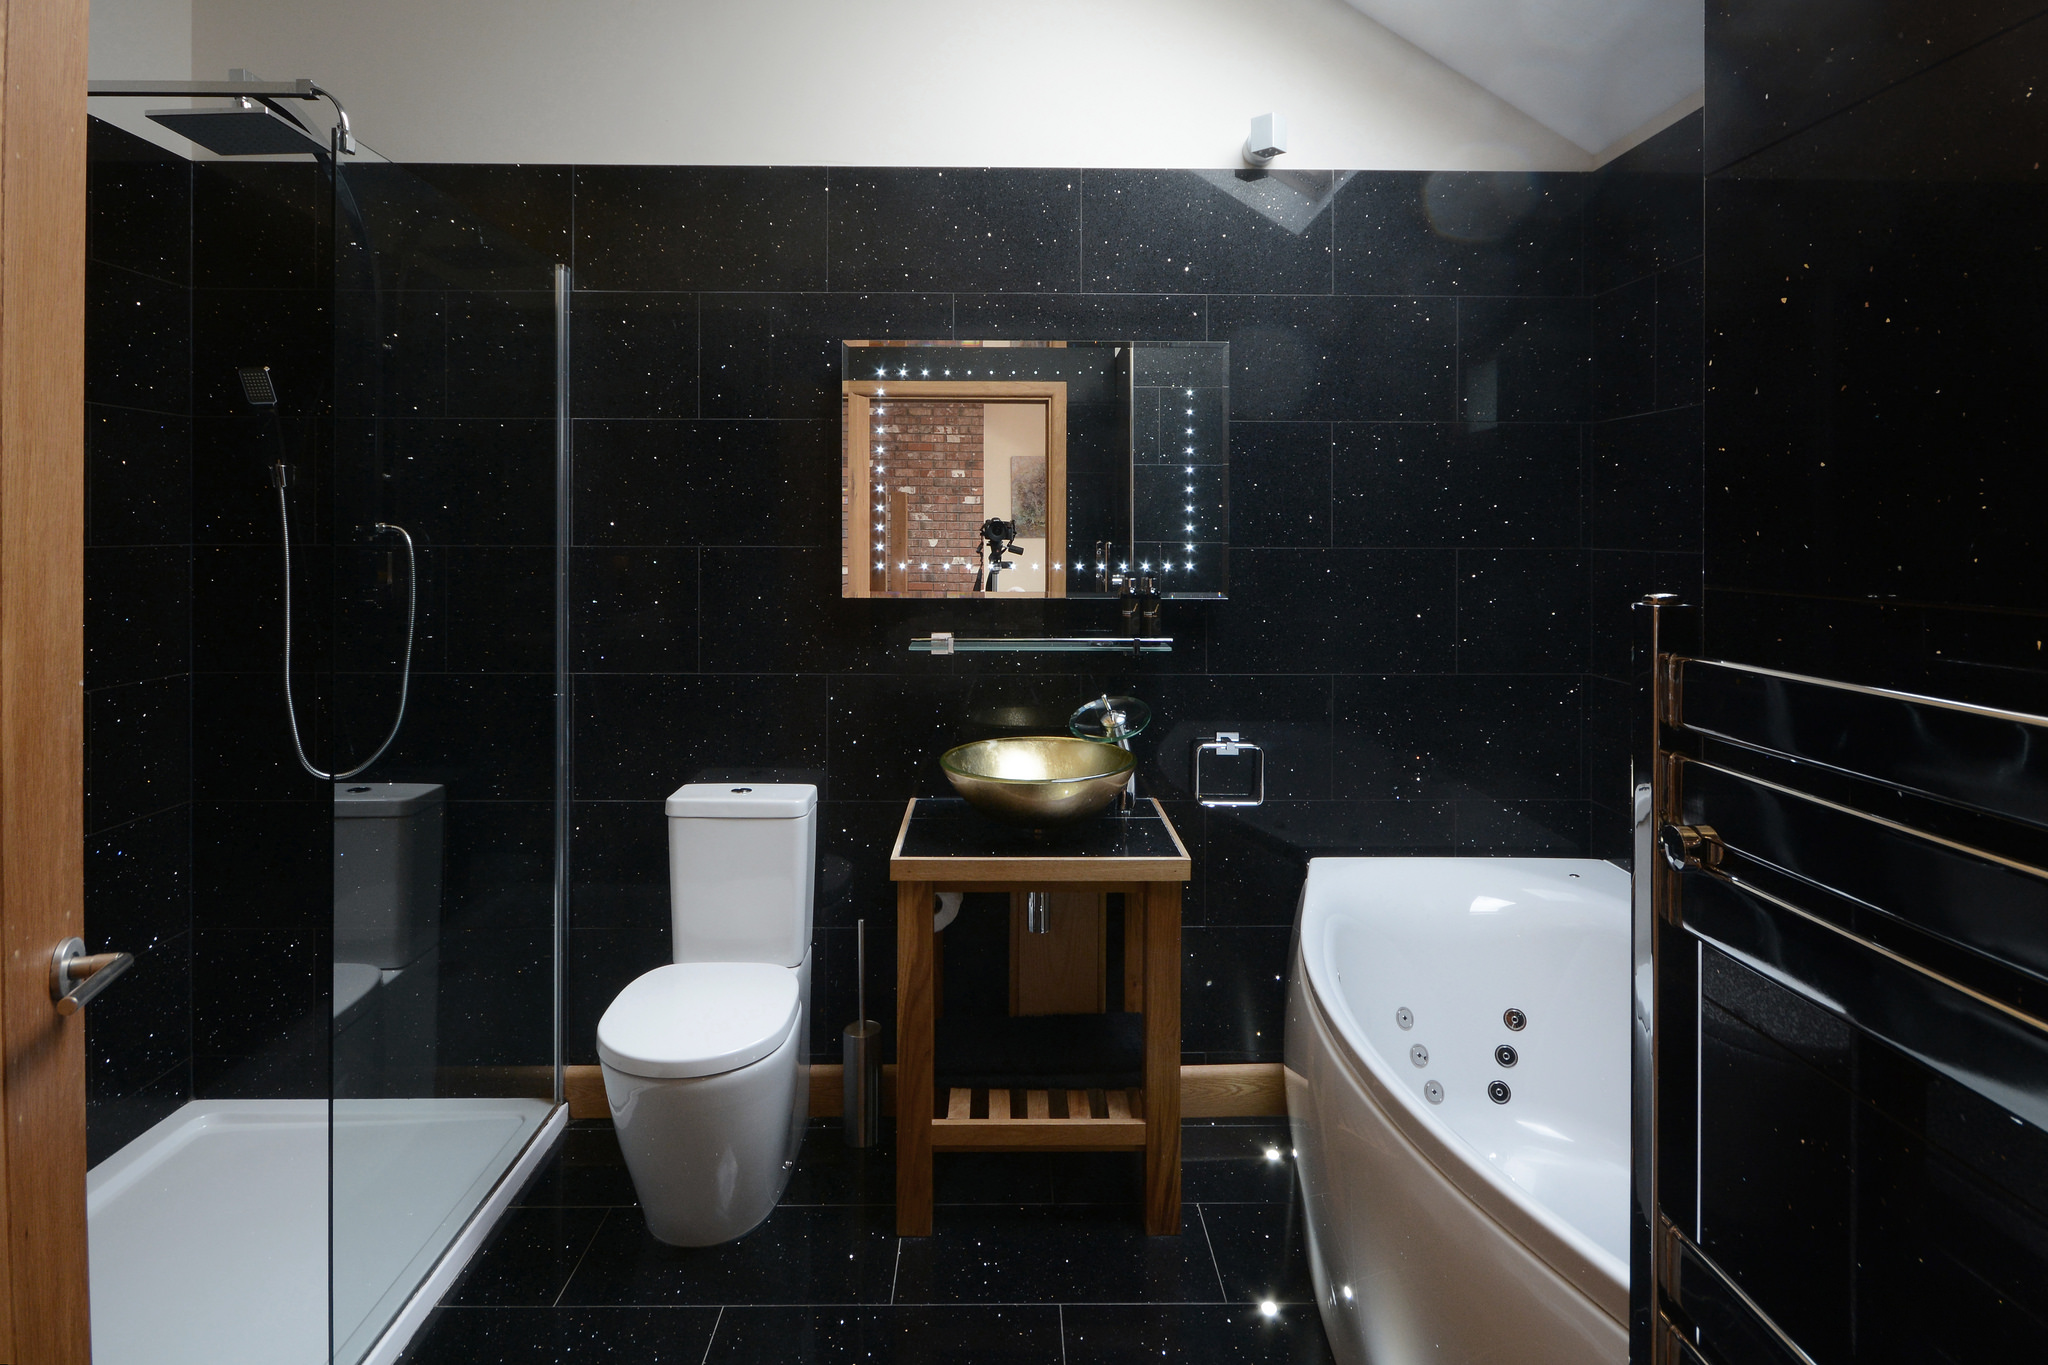 Milky Ways bathroom with spa bath and walk in shower